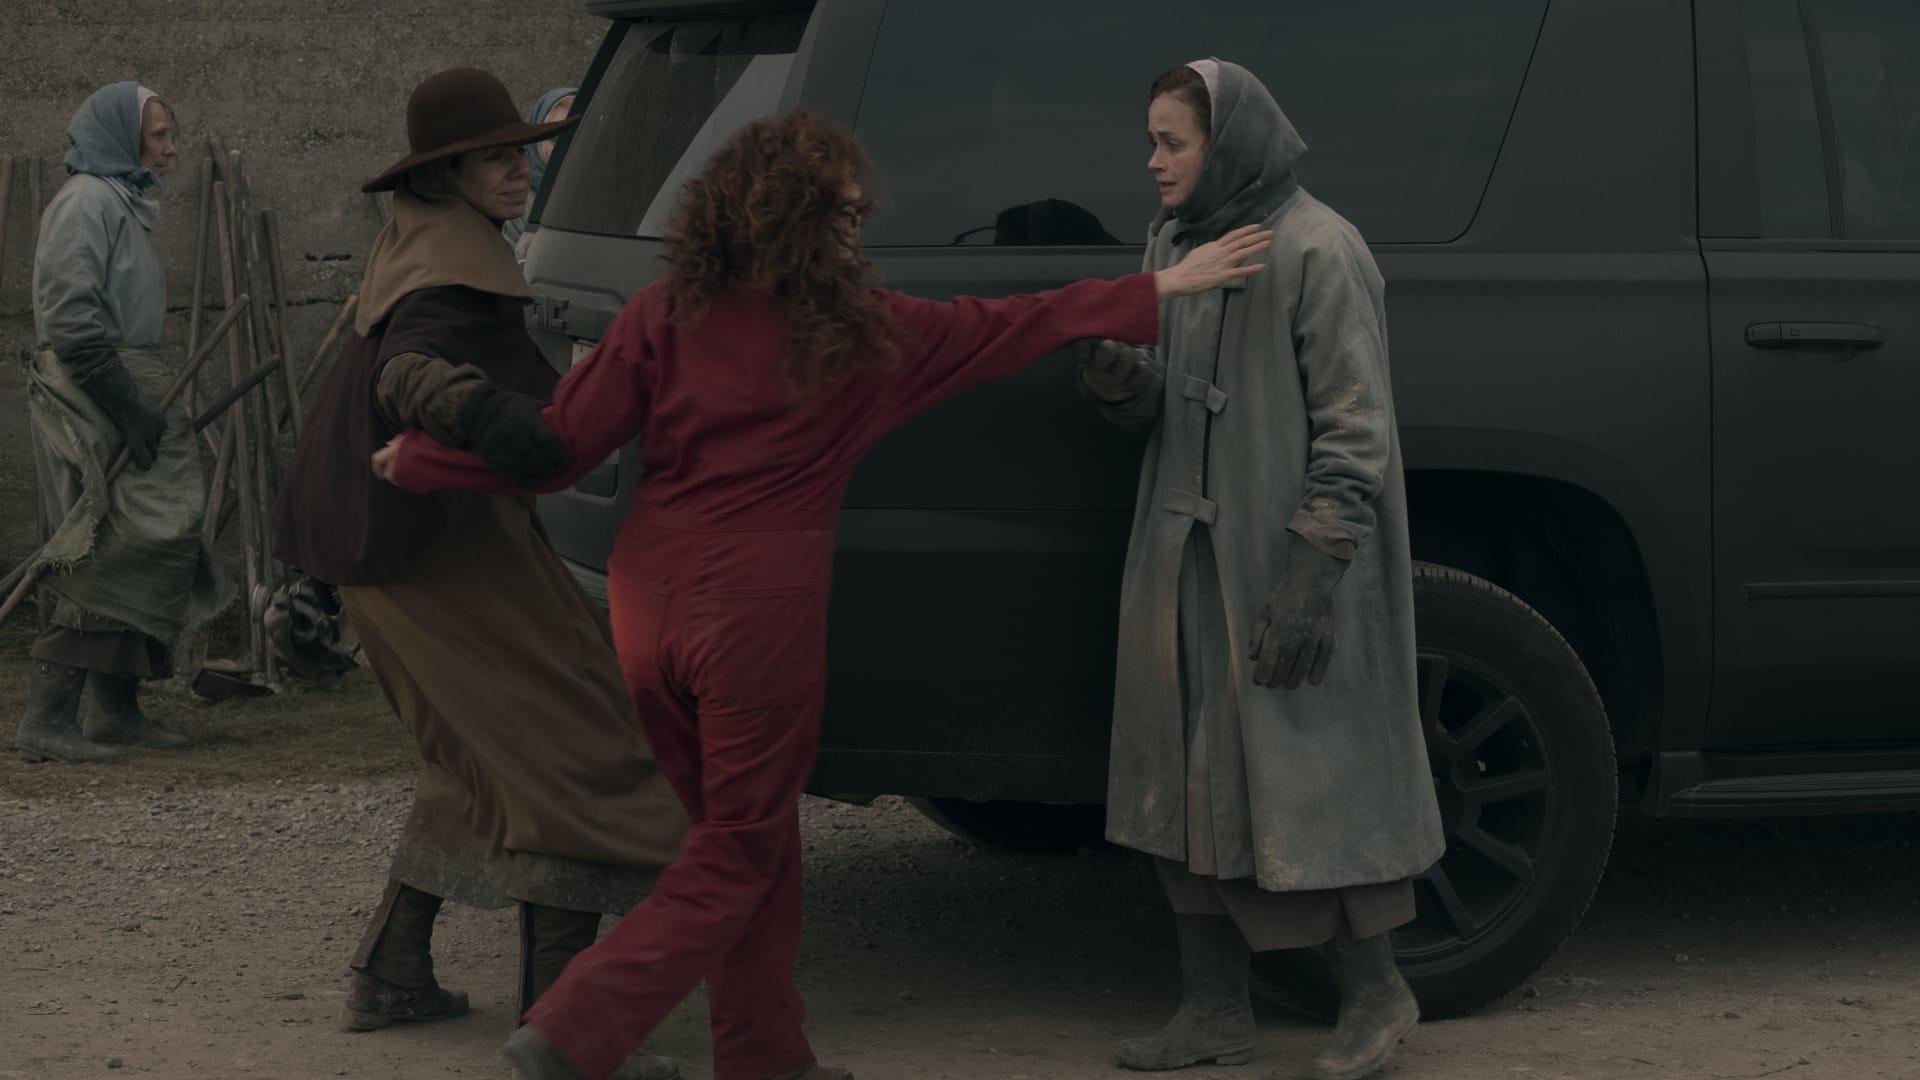 The Handmaid's Tale : La servante écarlate - Antifemmes